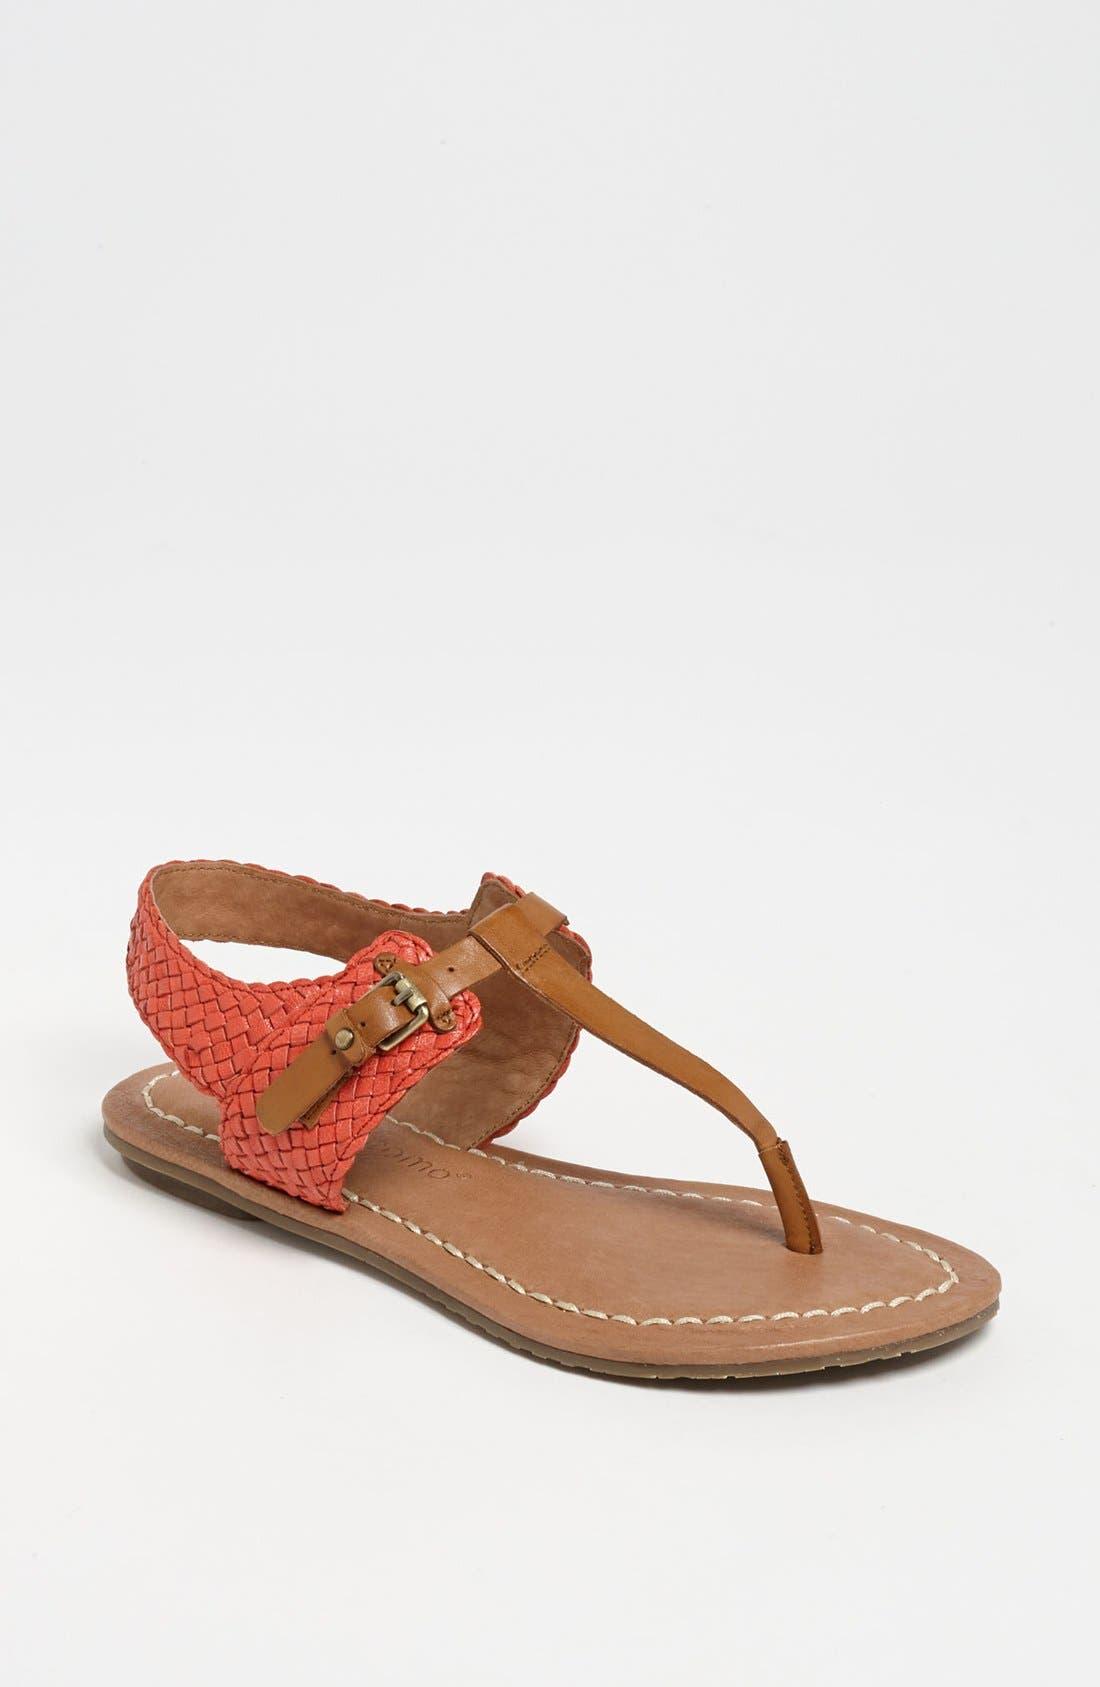 Alternate Image 1 Selected - Corso Como 'Behave' Sandal